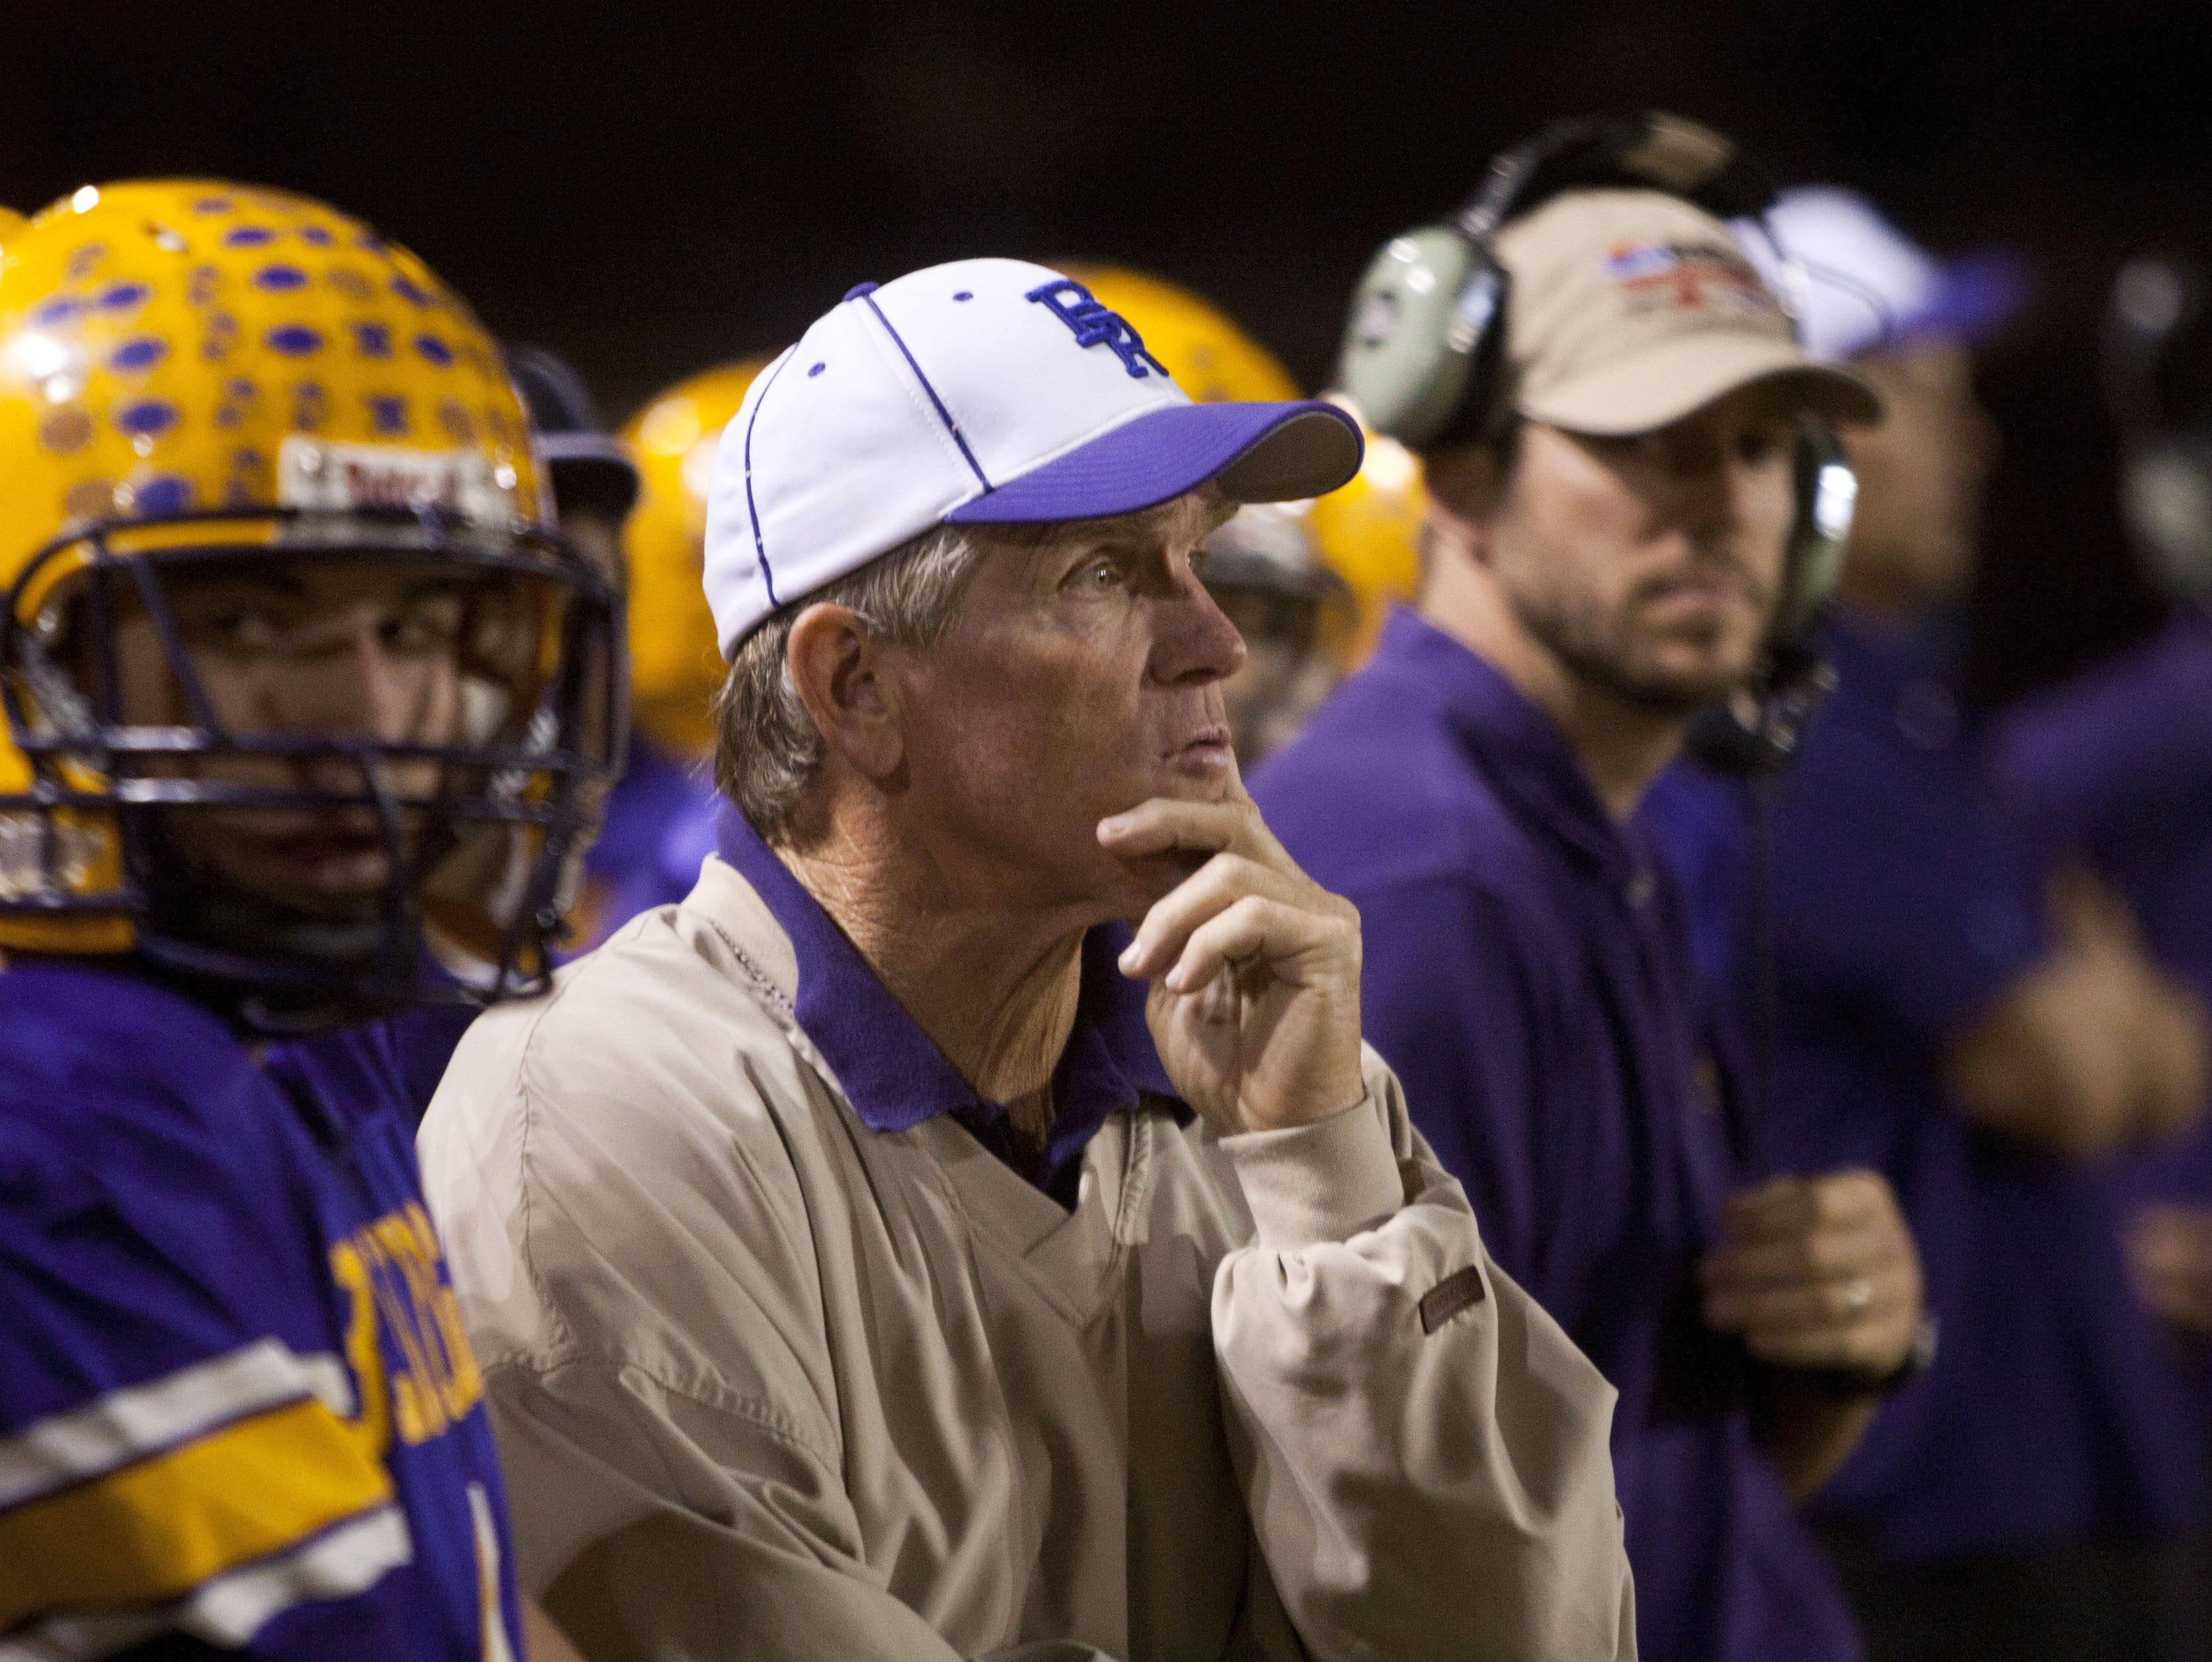 Paul Moro won 13 high school football state championships at Lakeside Blue Ridge.